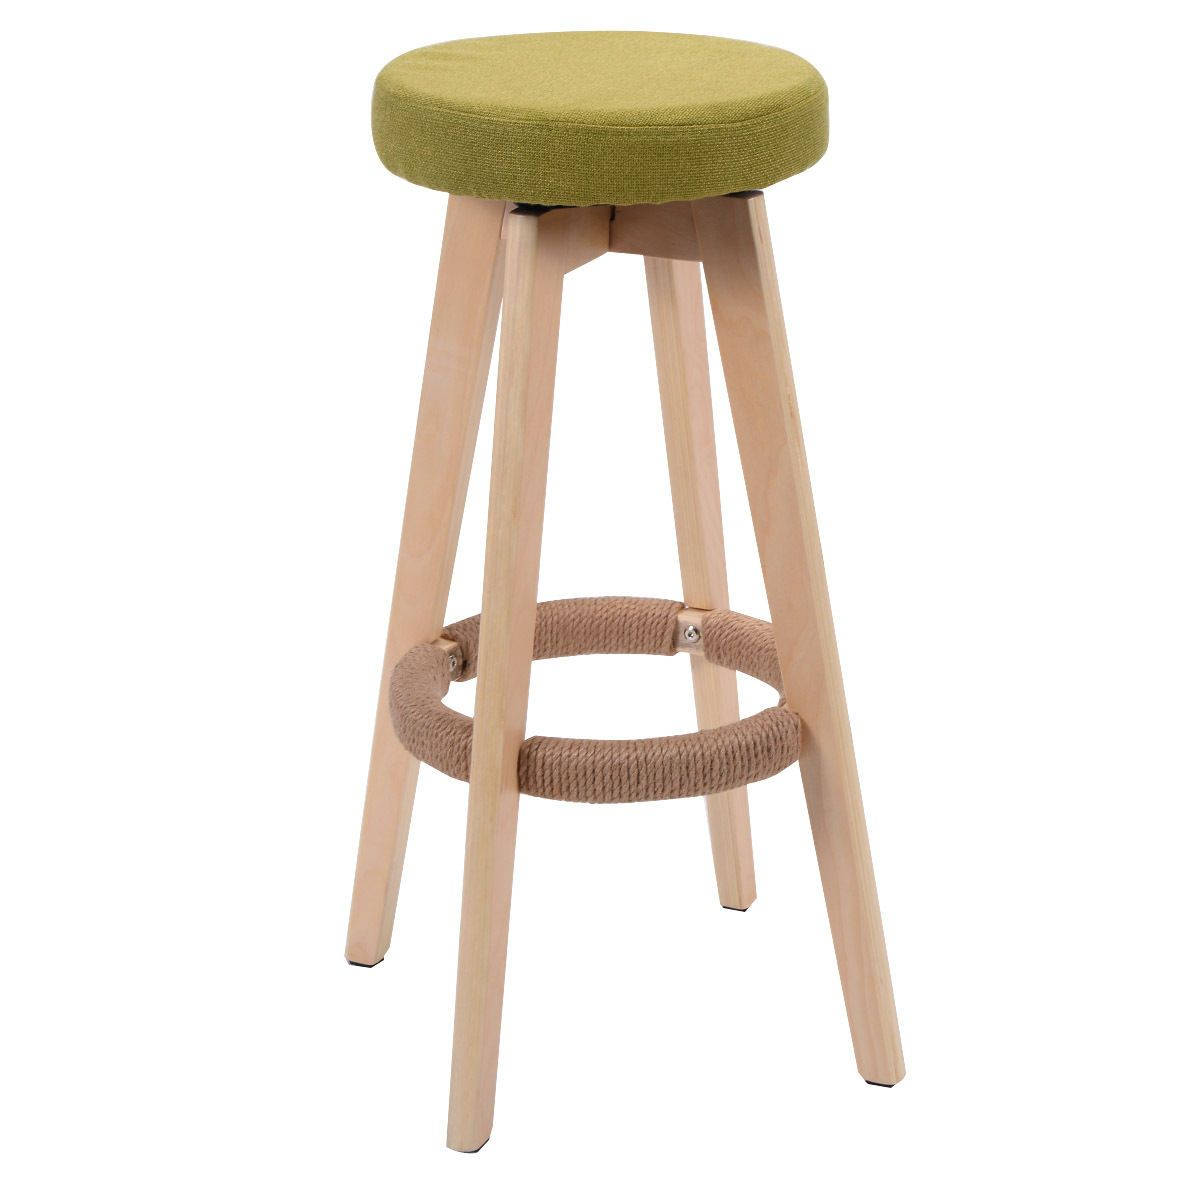 29″ Round Wood Bar Stool